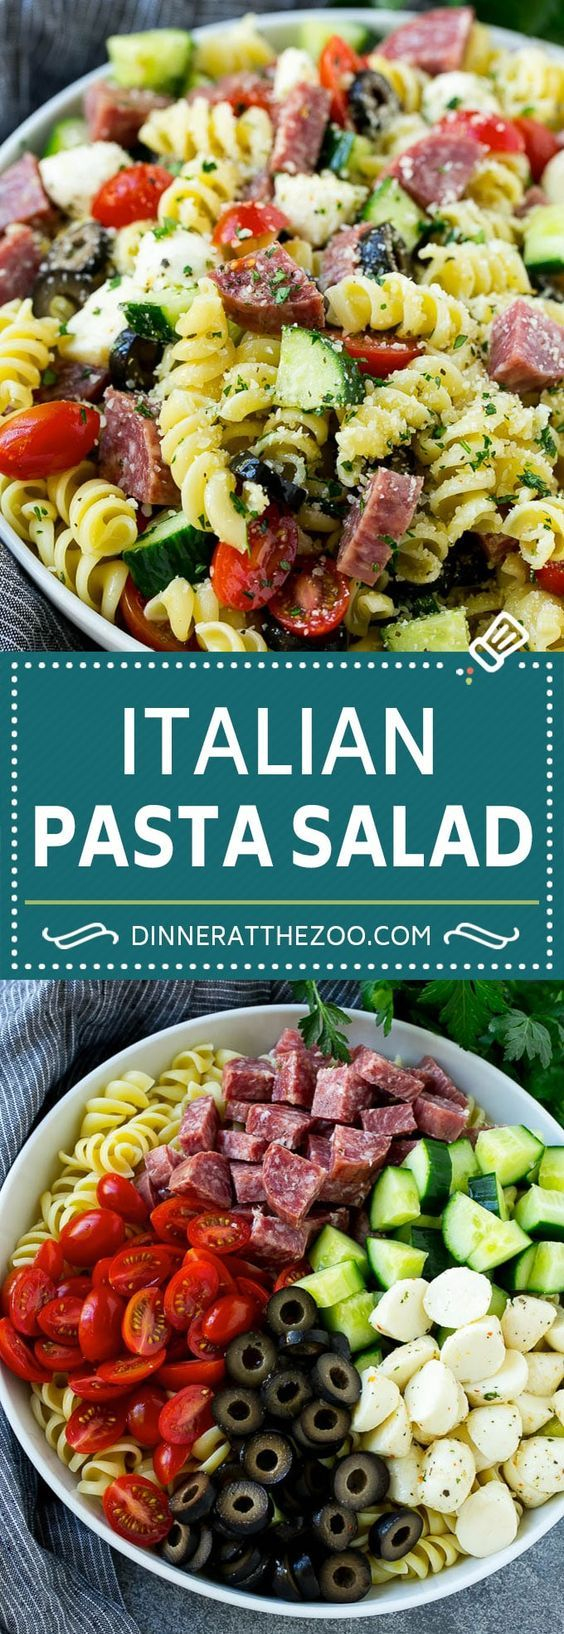 83 best Best Pasta Salad Recipes images on Pinterest | Casserole ...